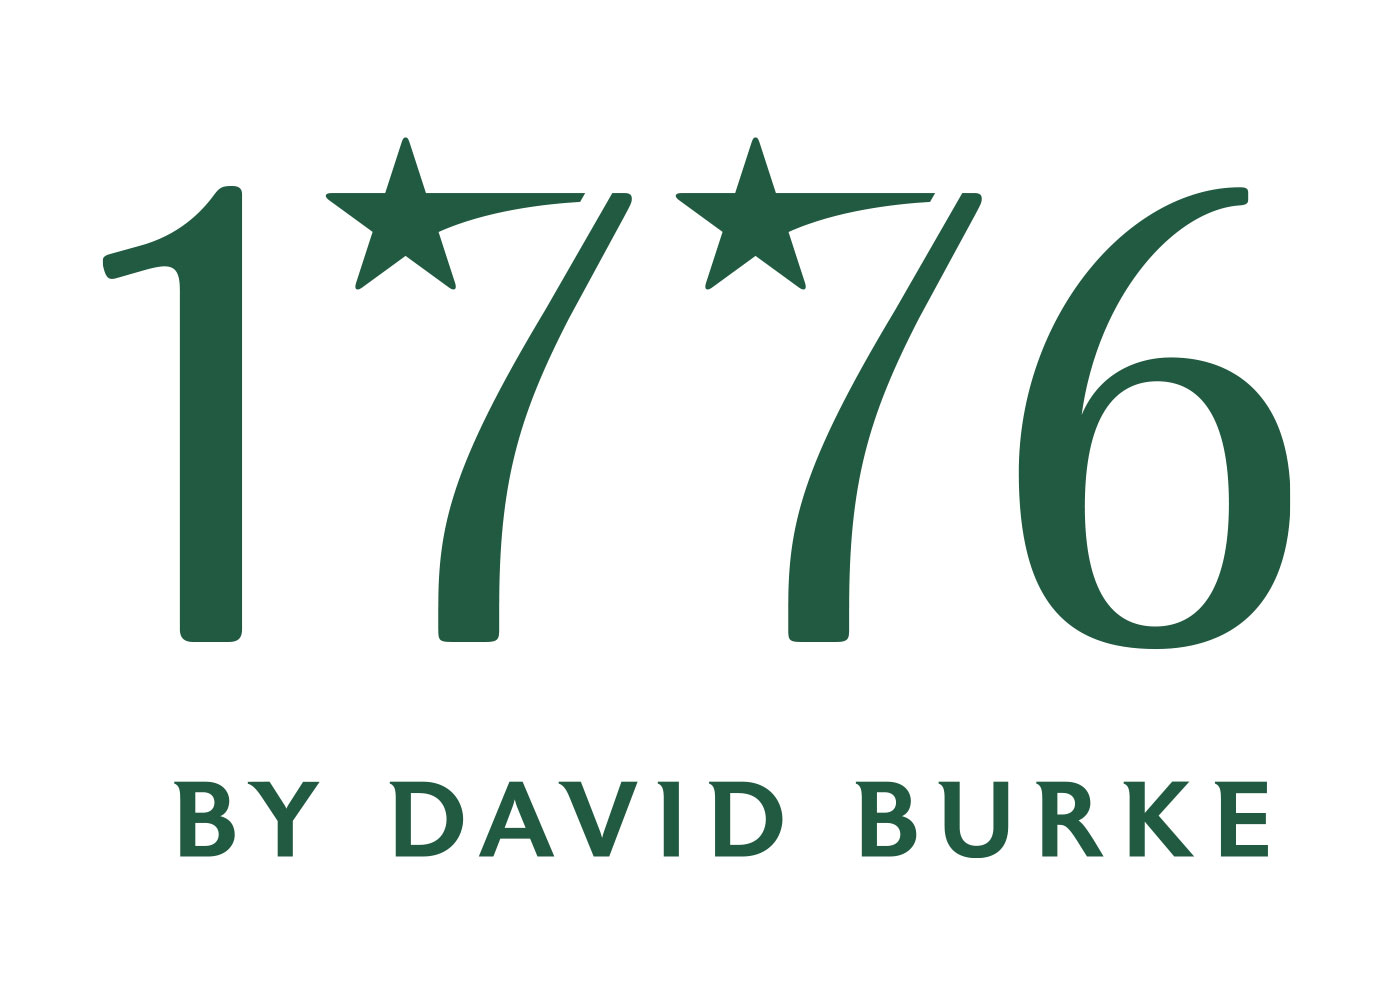 1776 by David Burke logo